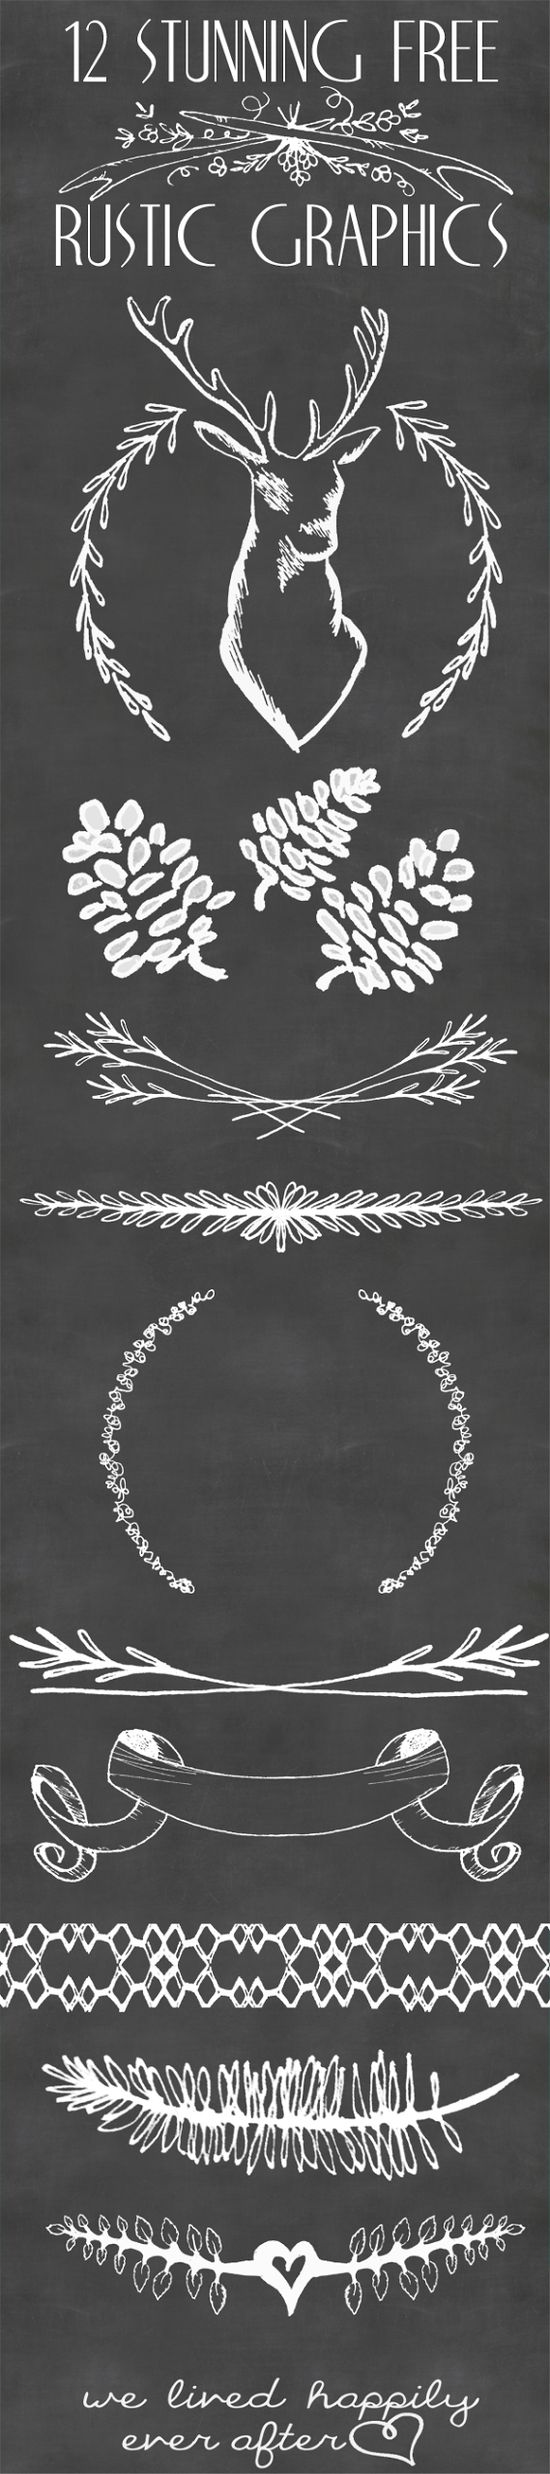 rustic hand drawn graphics